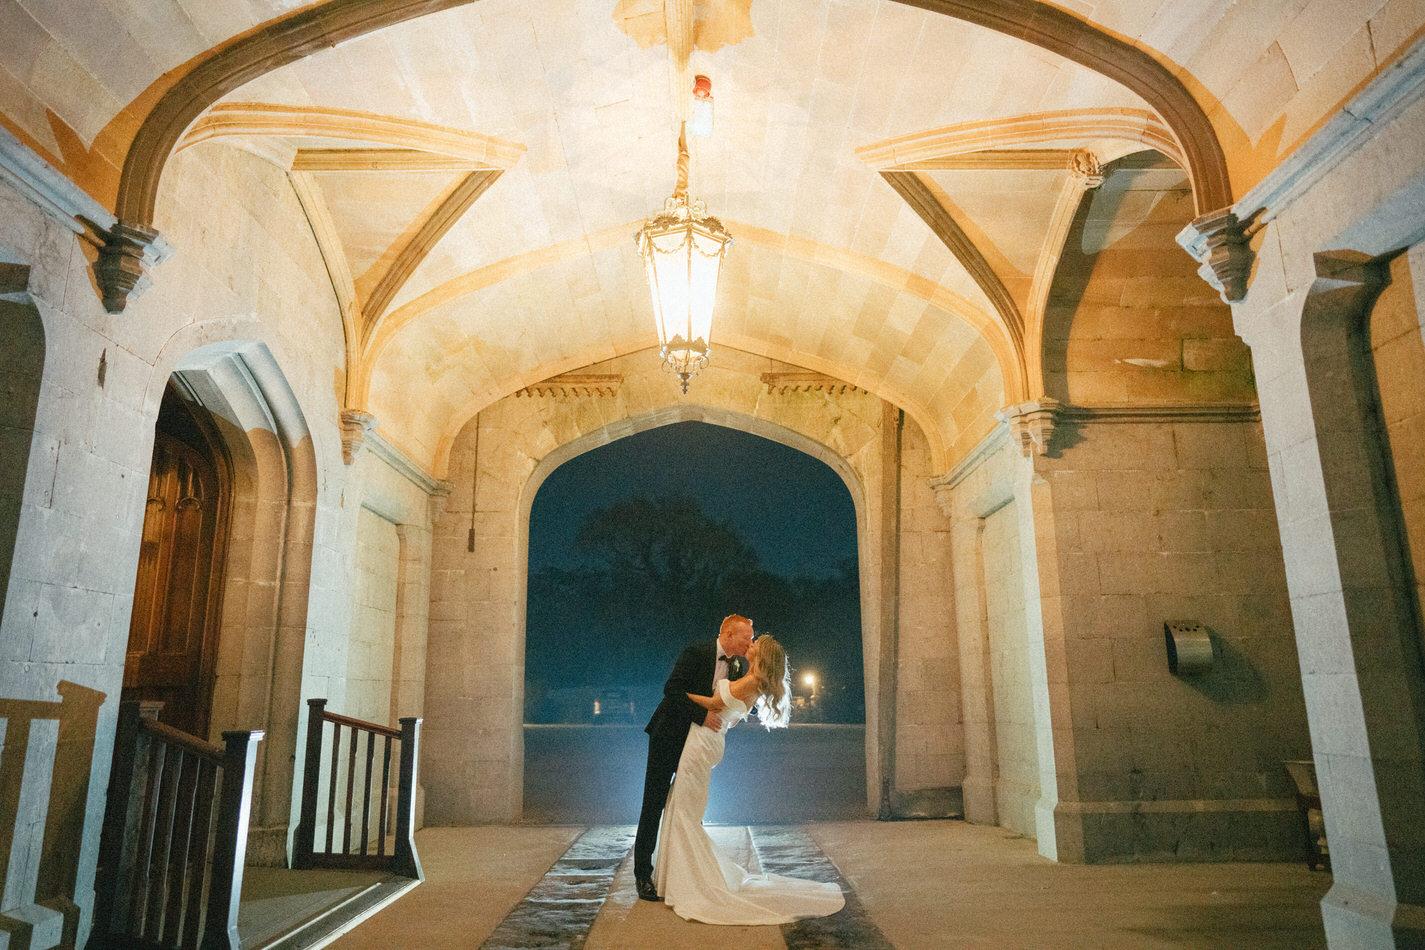 Castle-wedding-ireland-photos- 0350 261